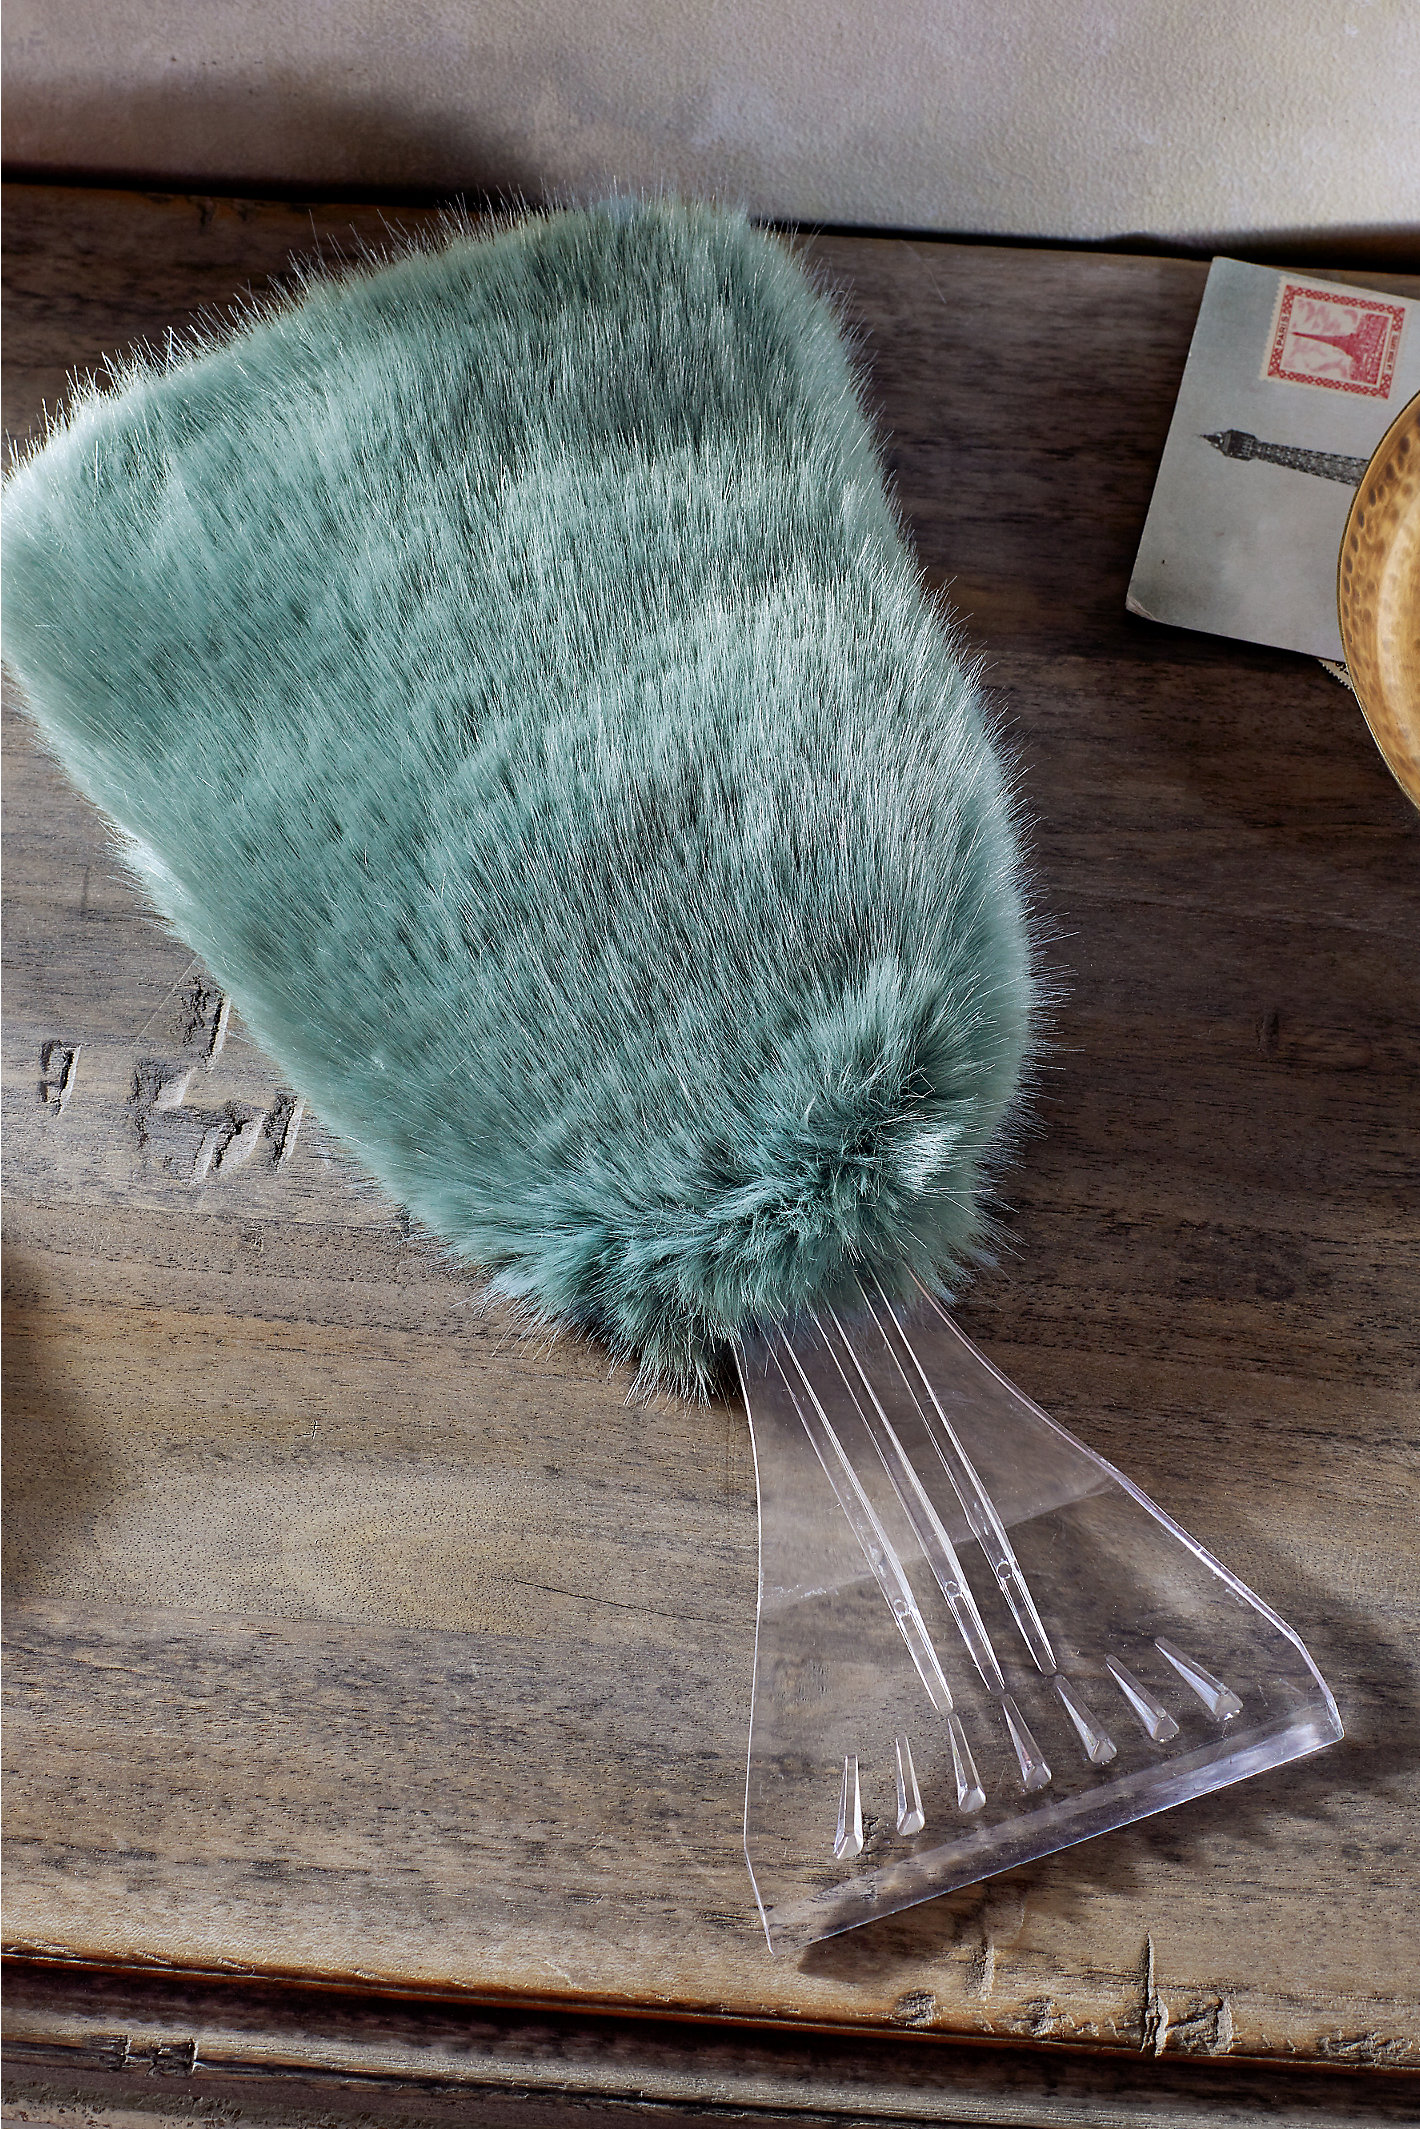 Amanda Faux Fur Ice Scraper